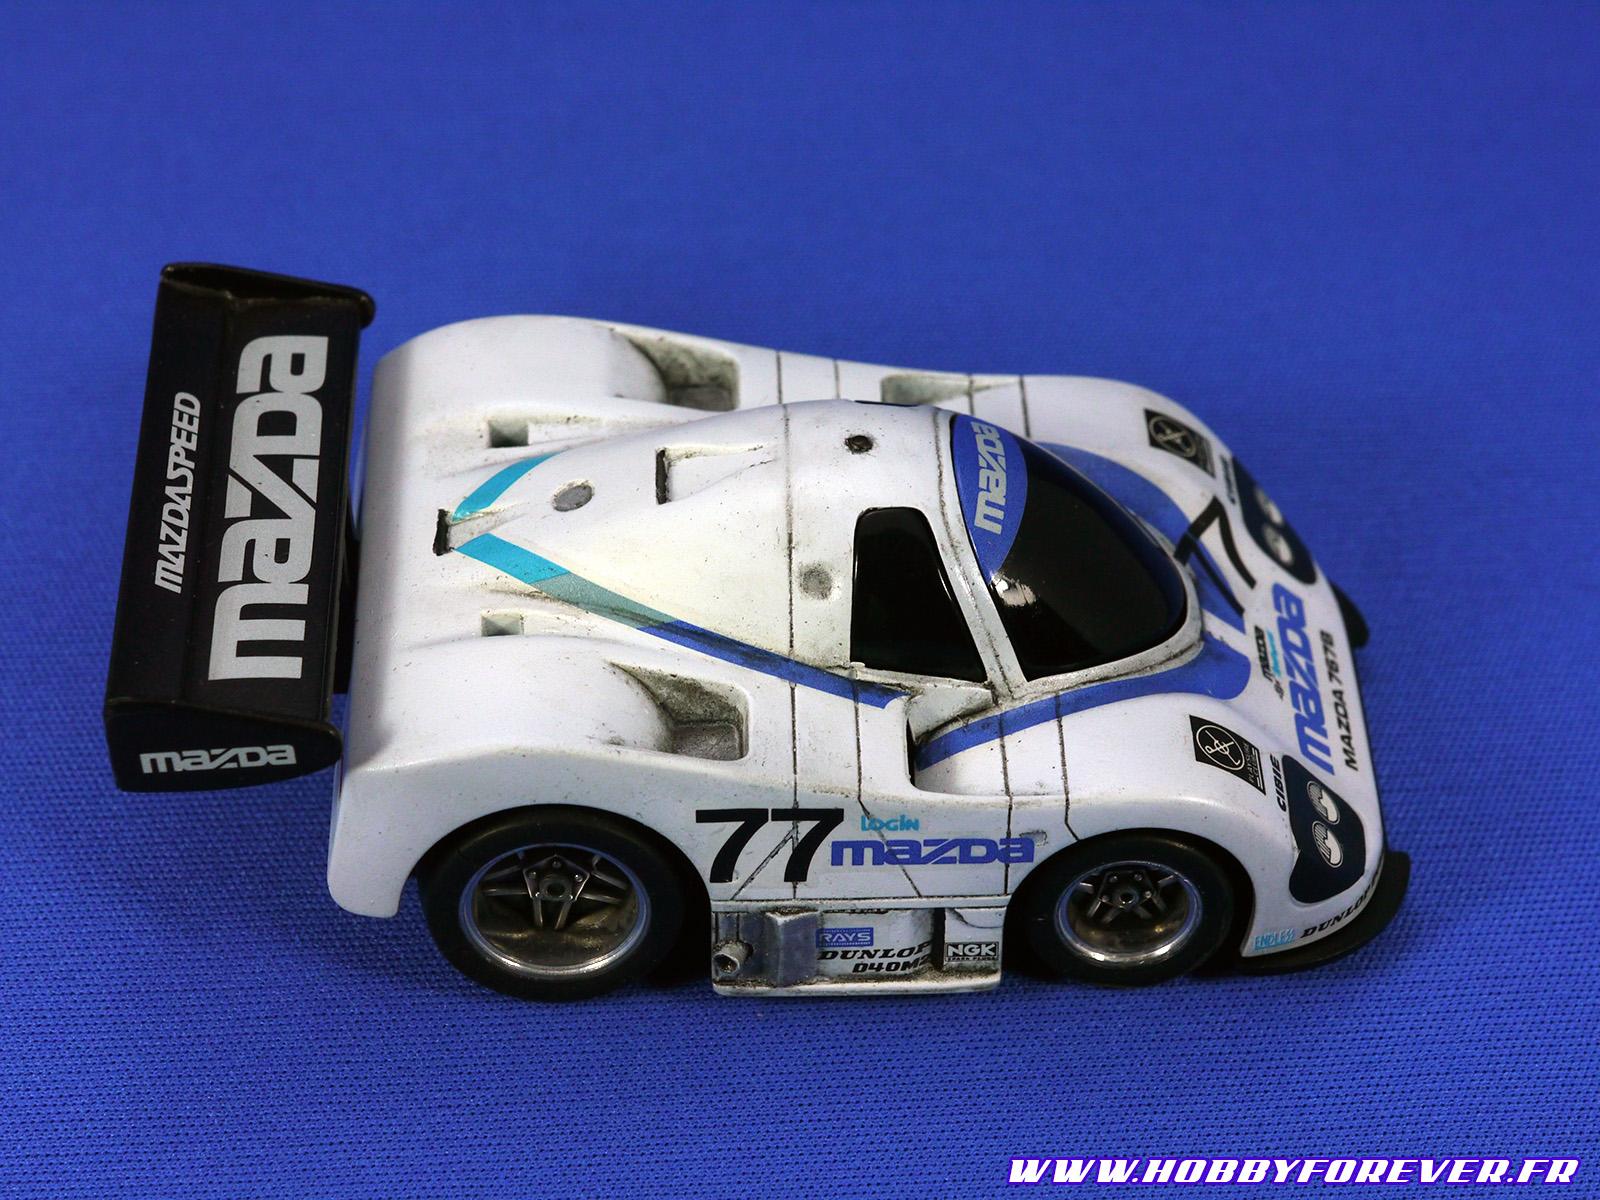 Daytona Mazda 767B – Mid-Racer Collection de Mitsuwa